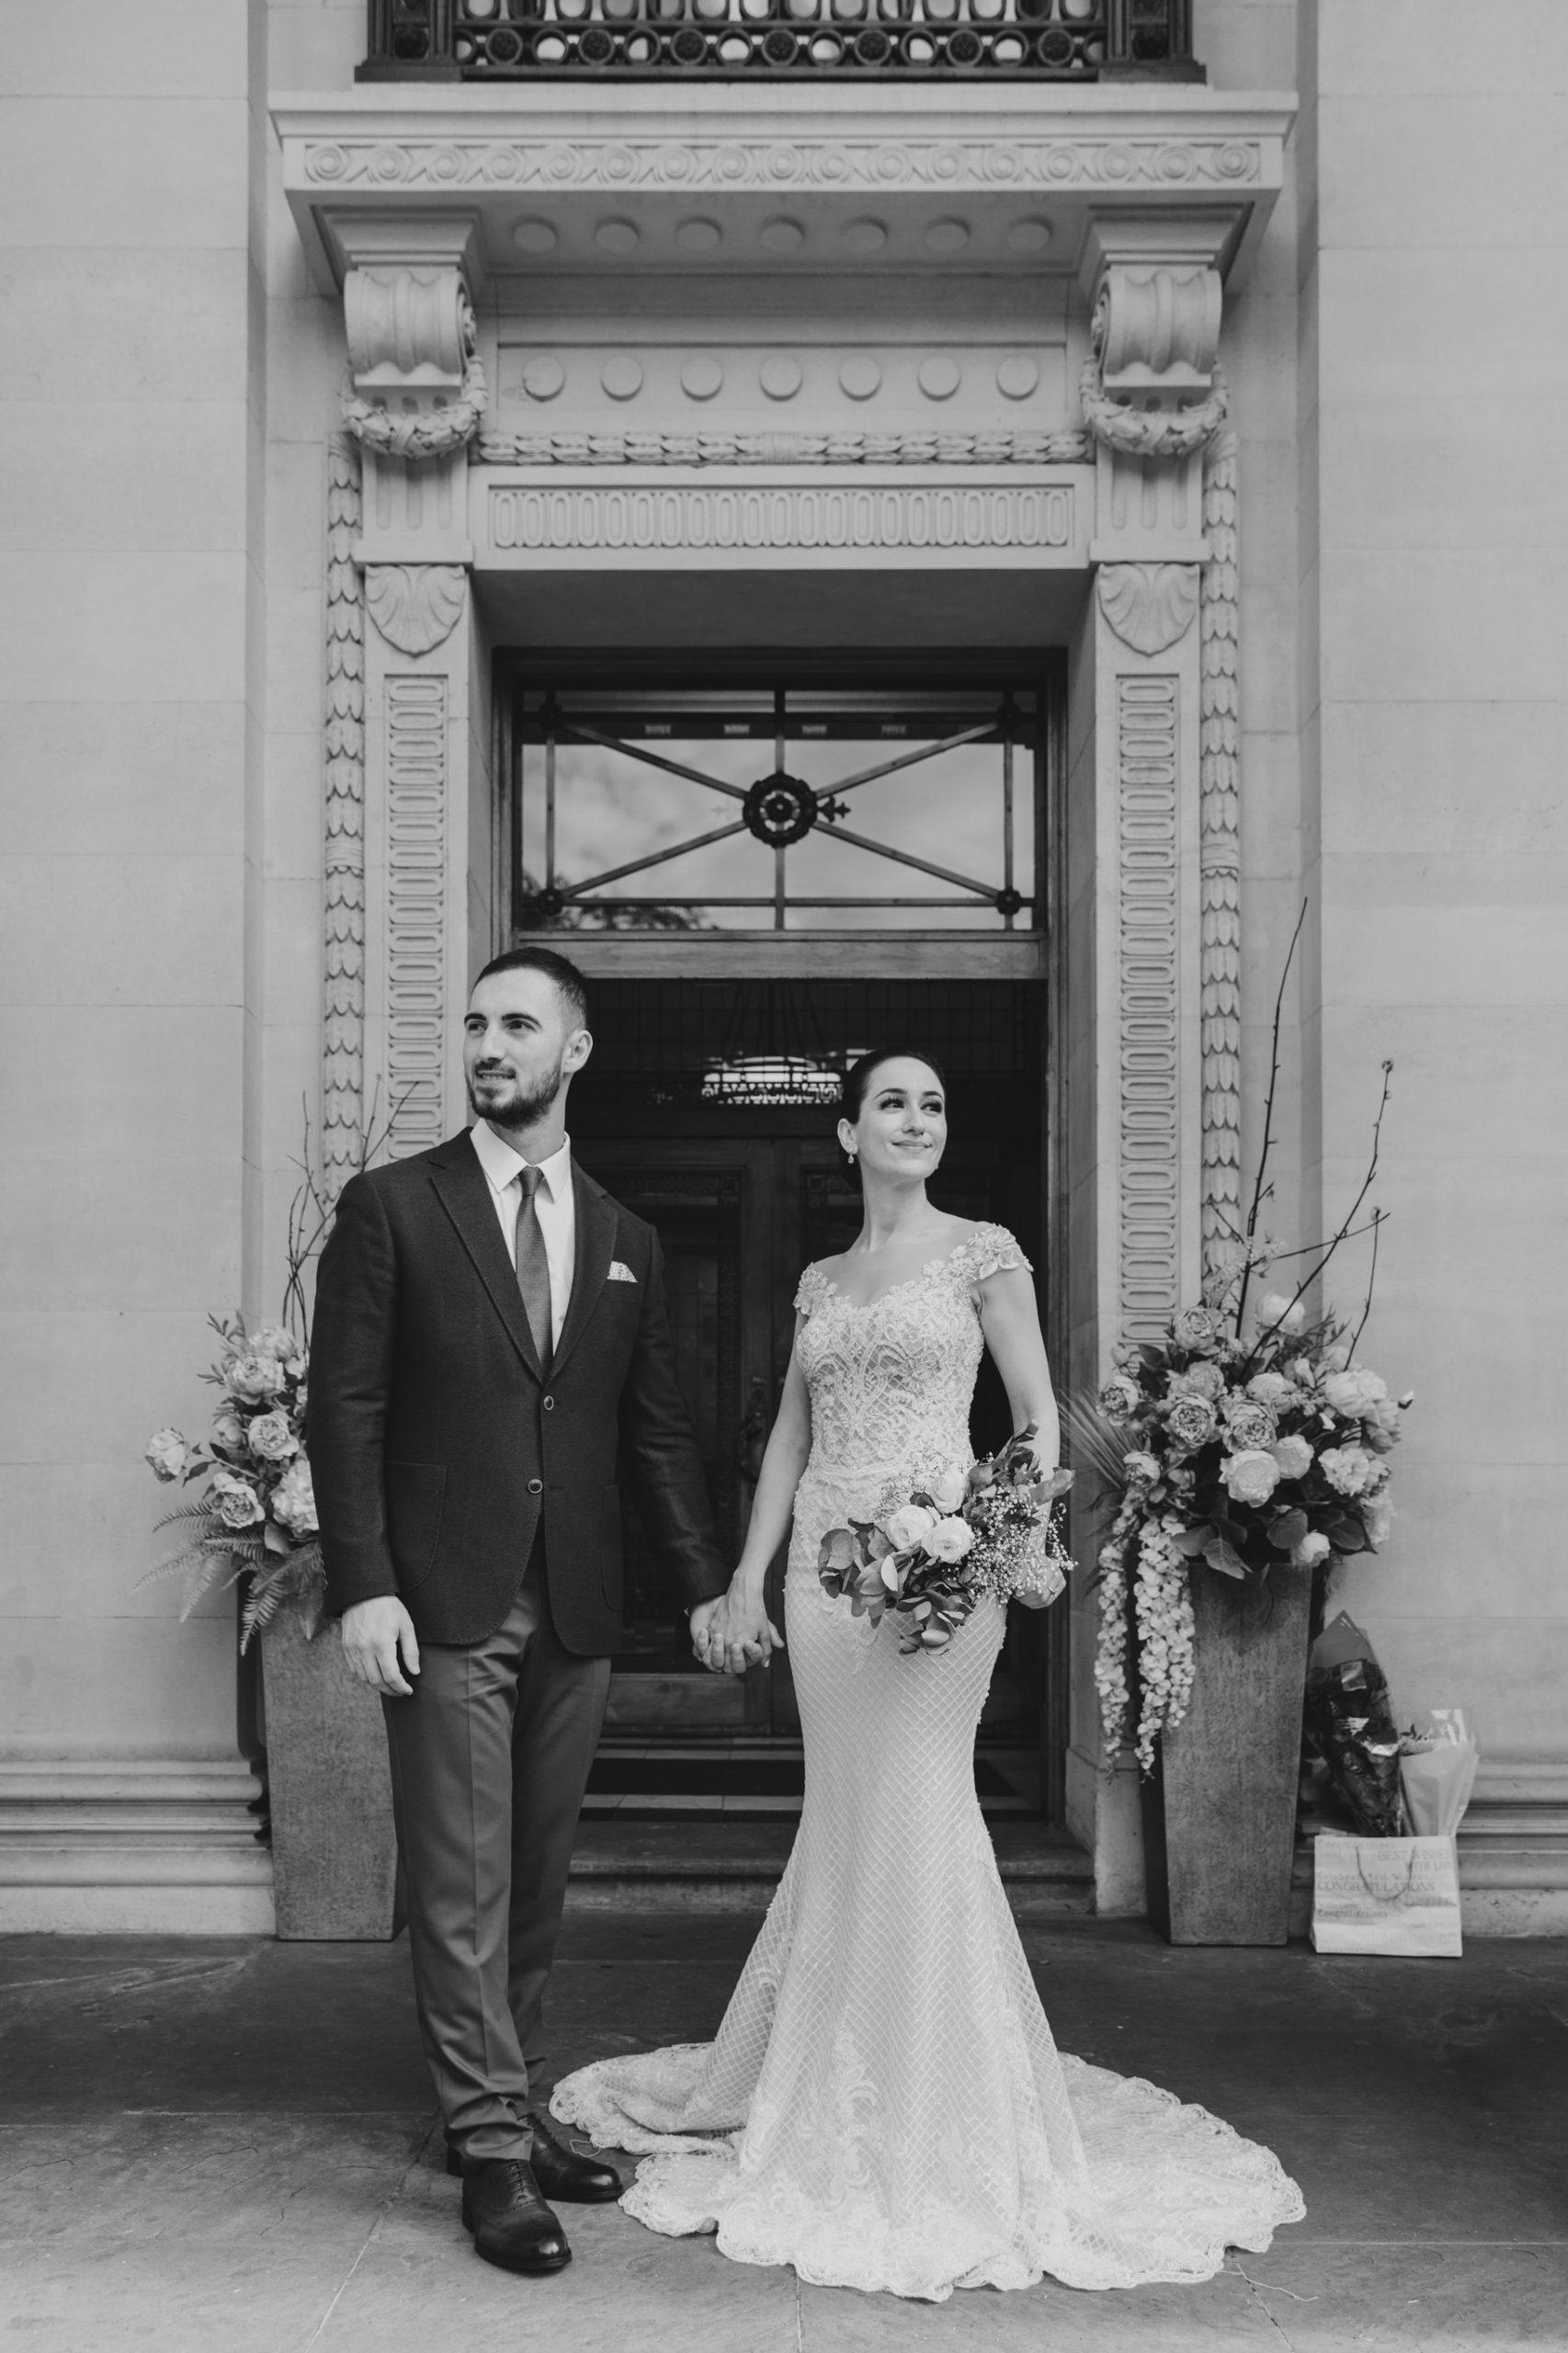 Ebru & Emre wedding - Old Marylebone town hall